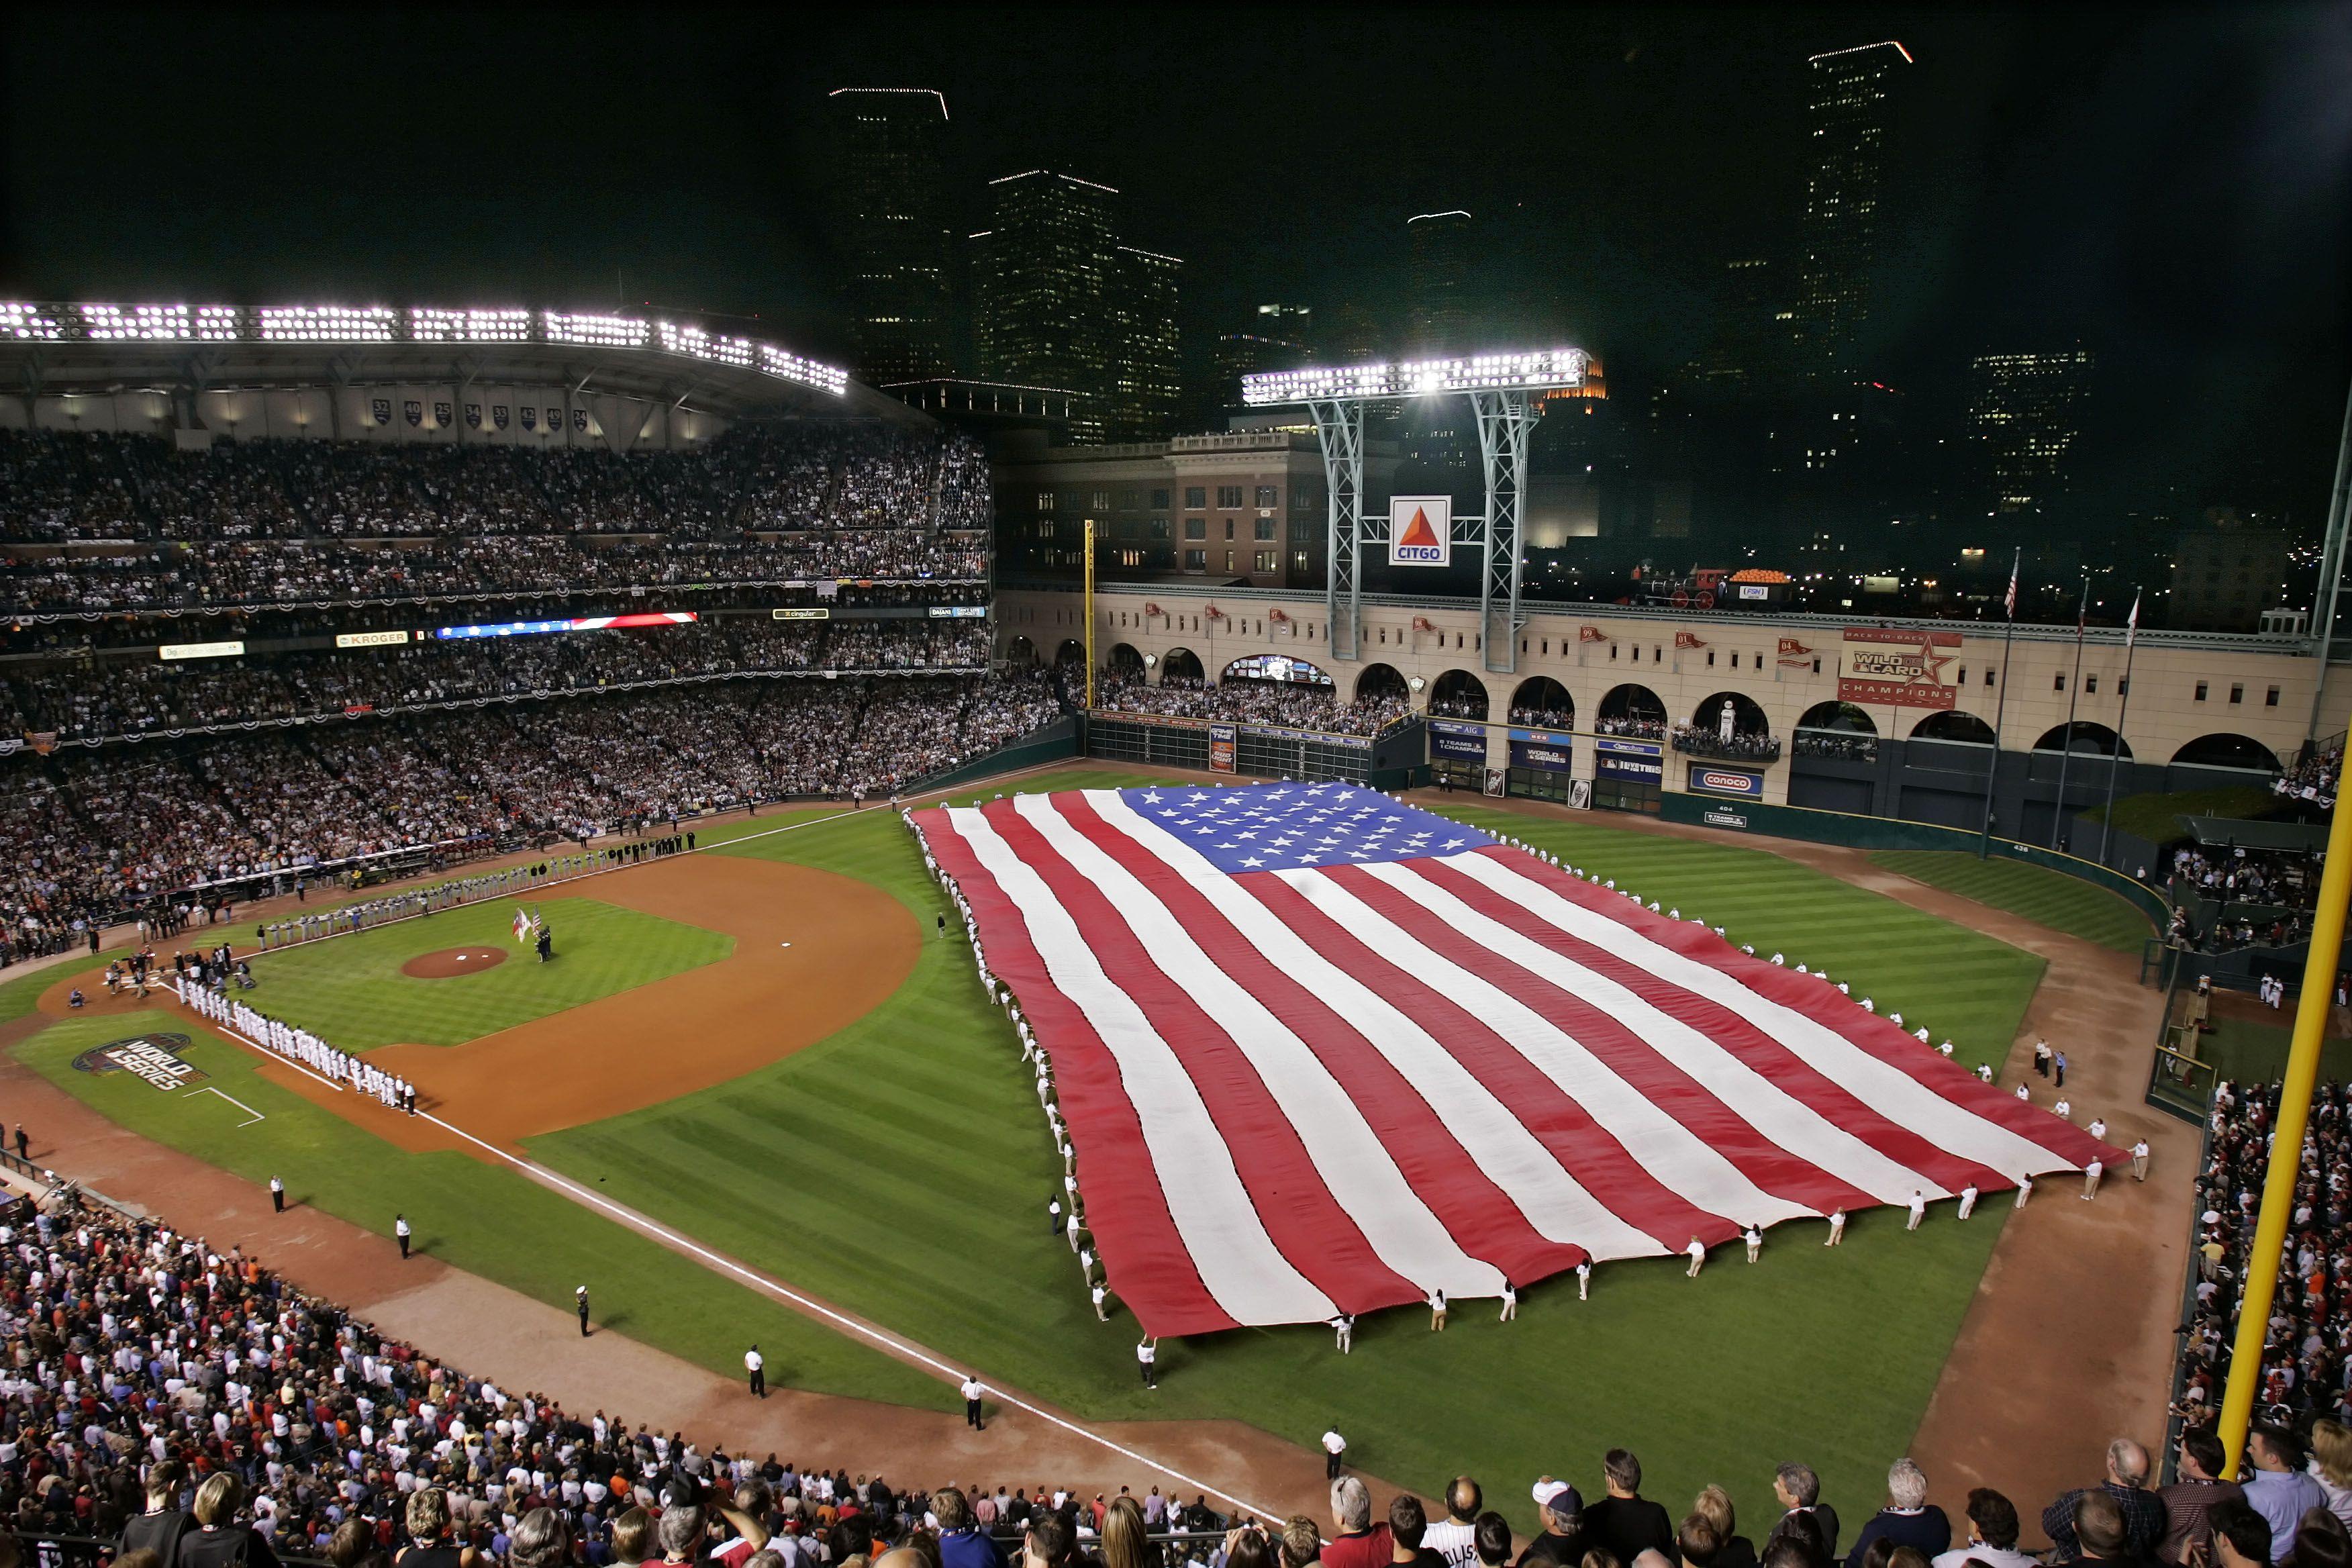 Minute Maid Park In Houston Texas Home Of The Astros Mlb Stadiums Baseball Park Minute Maid Park